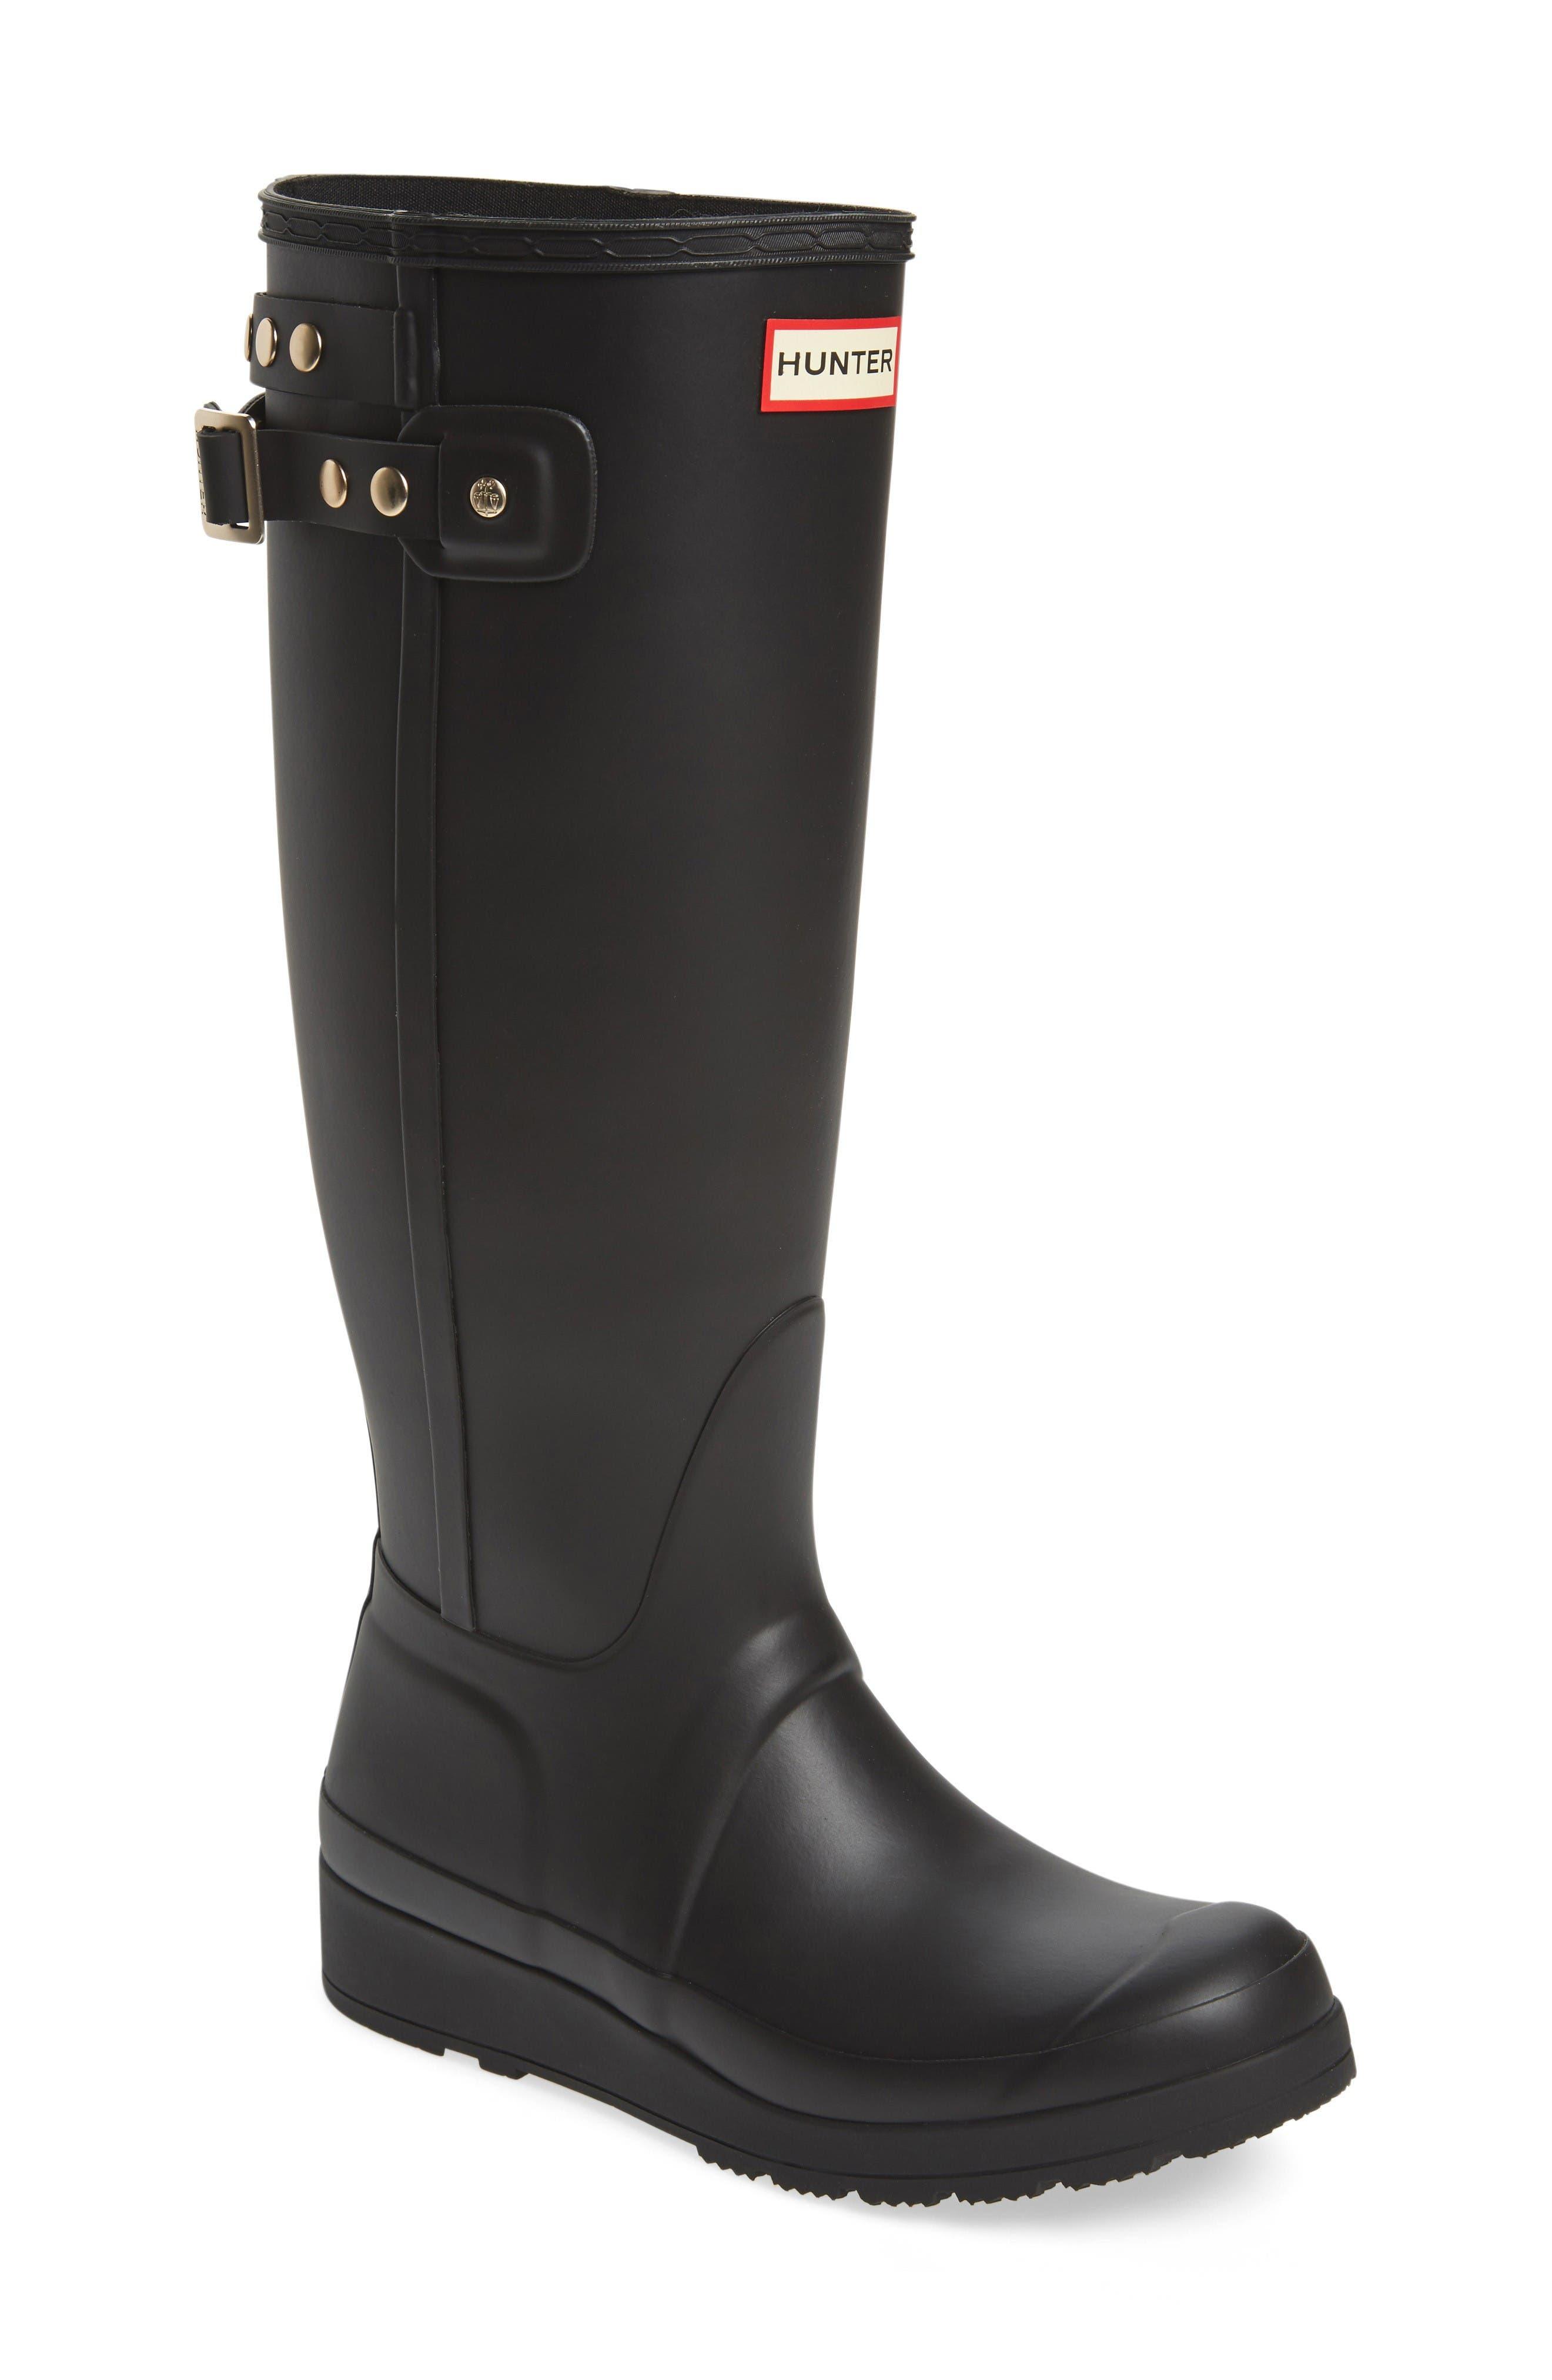 Alternate Image 1 Selected - Hunter Original Tall Studded Wedge Rain Boot (Women)